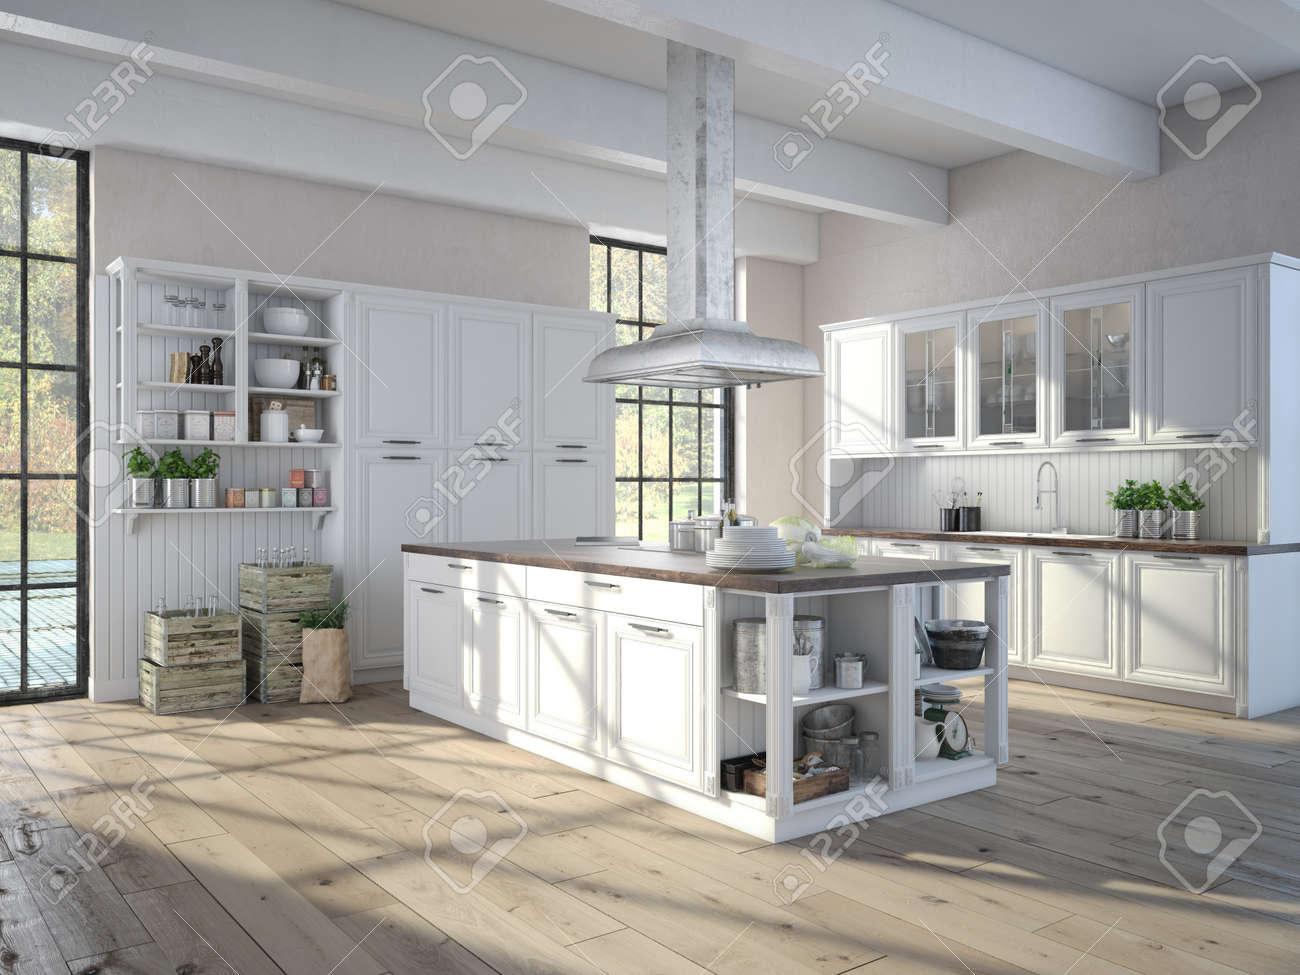 Großzügig Edelstahl Küchengeräte Ideen - Küche Set Ideen ...